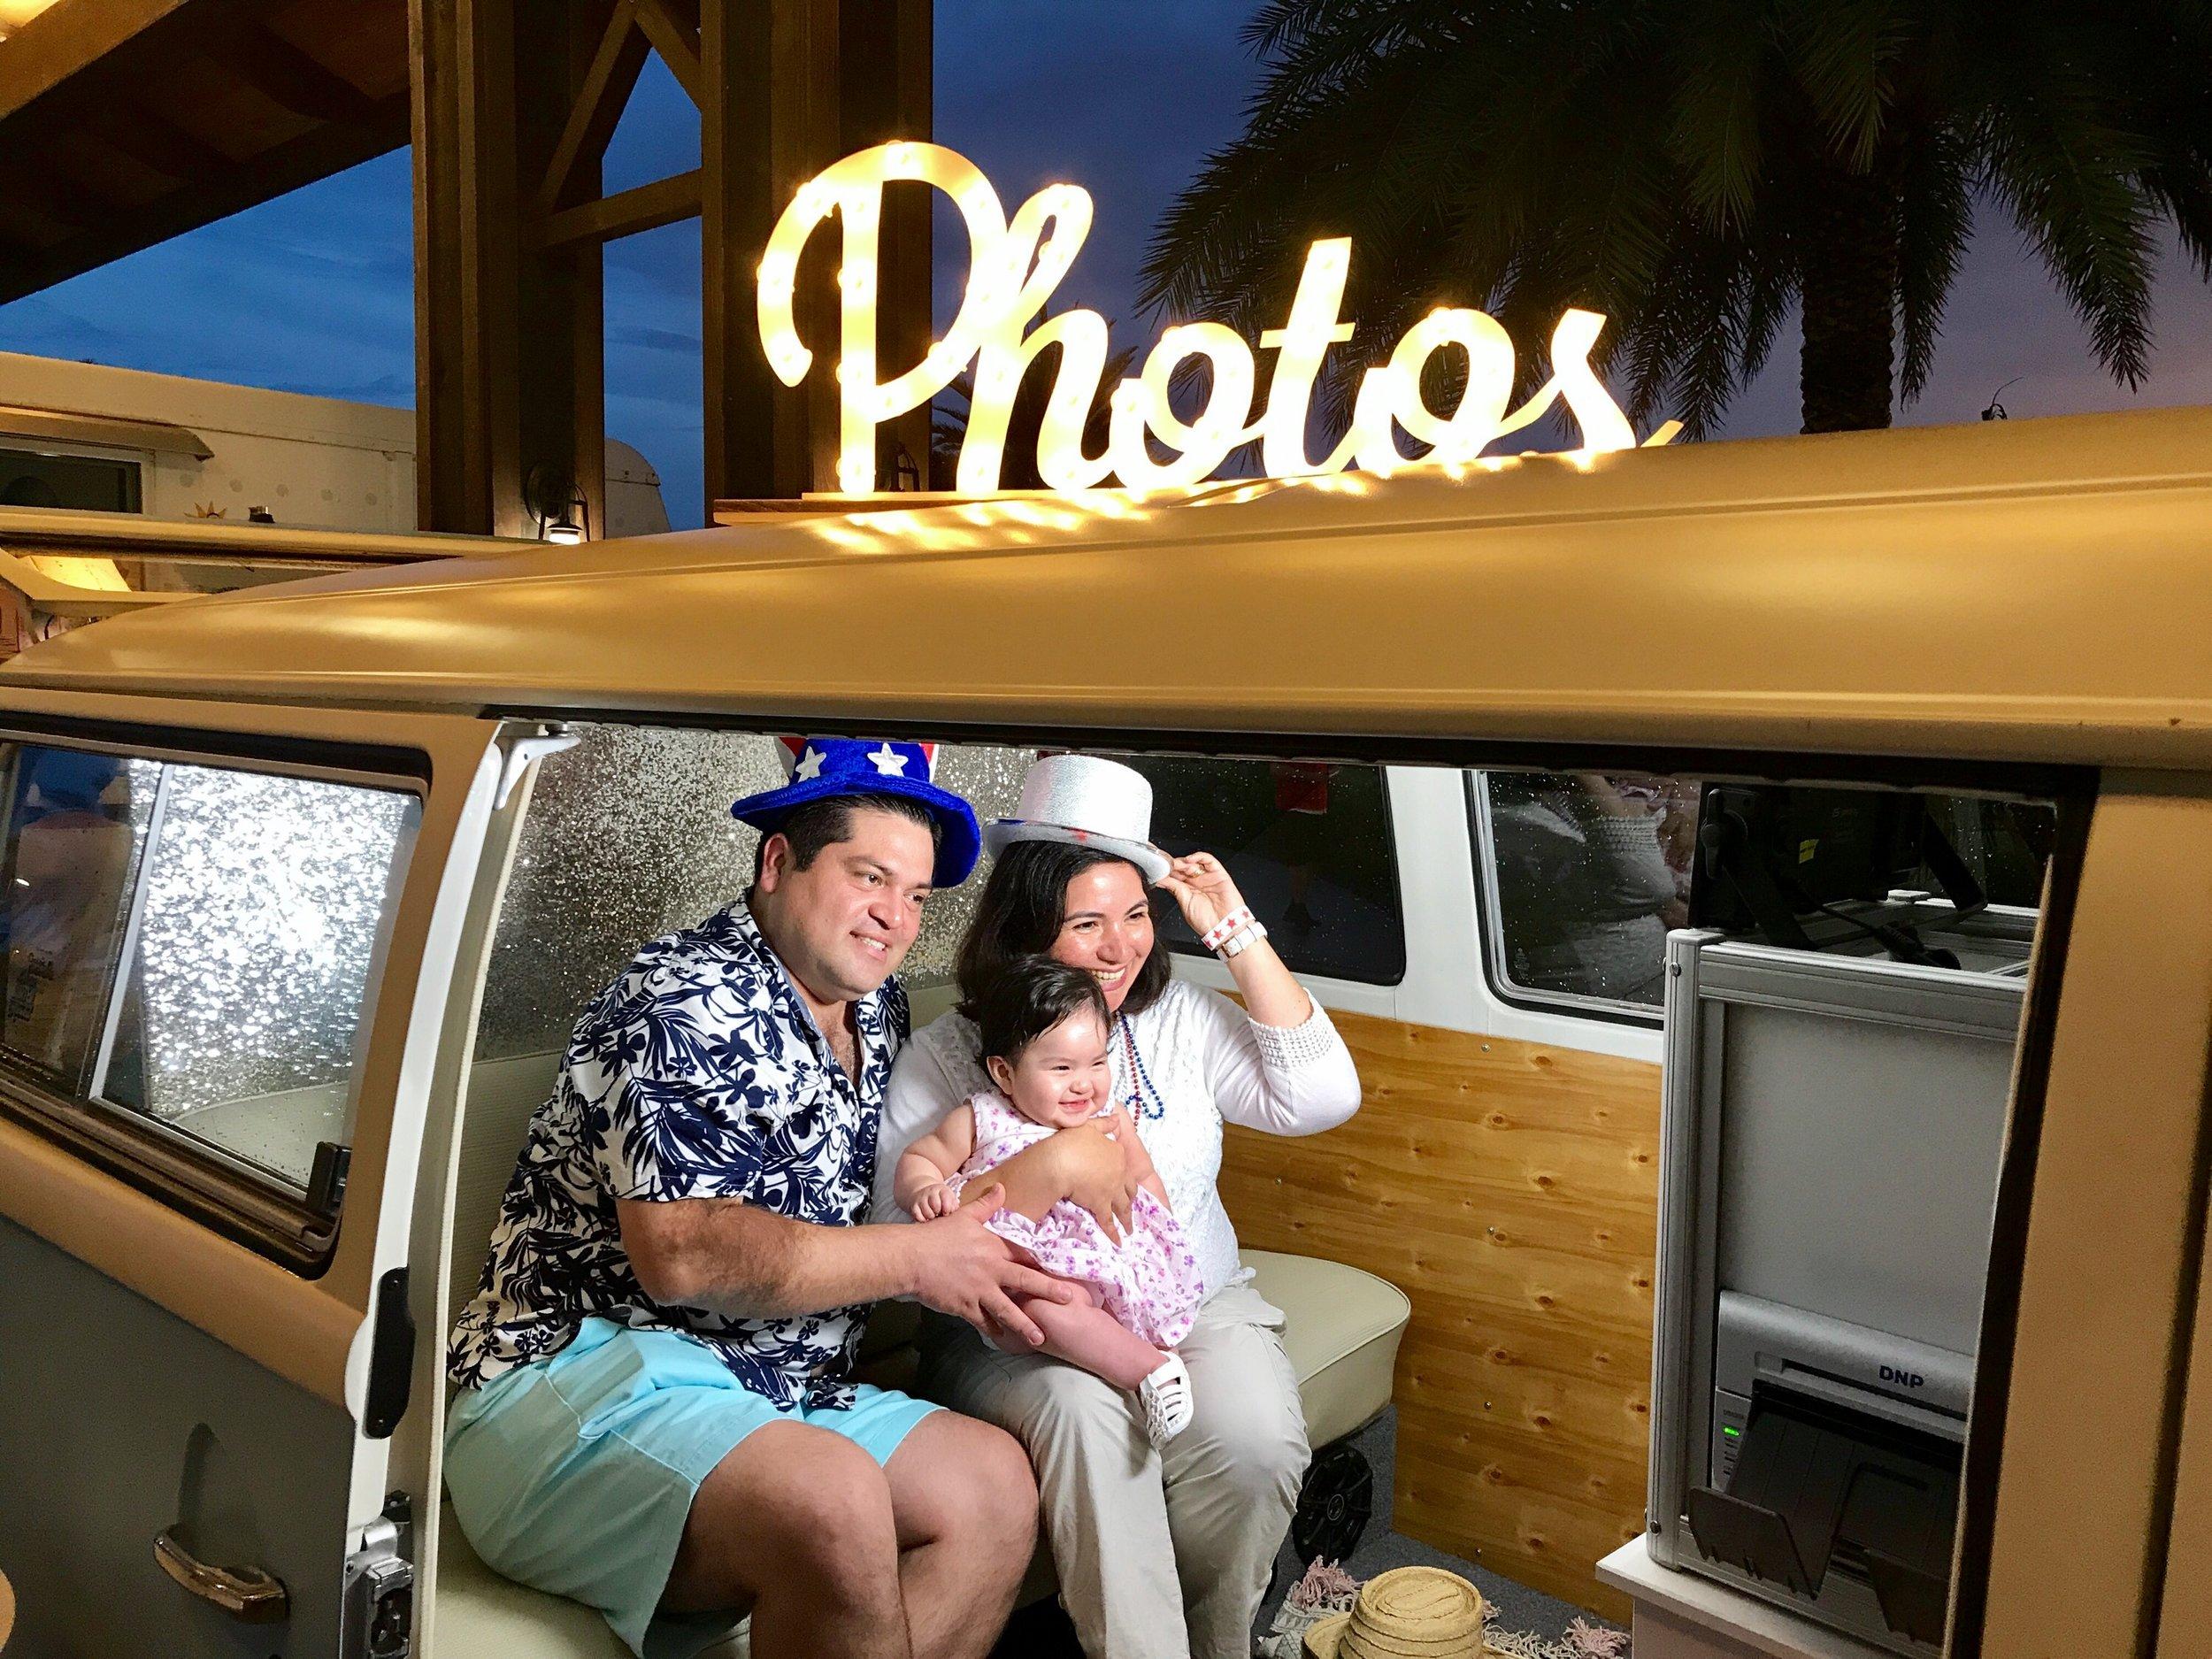 Family photo in the VW bus photo booth- Bradenton FL